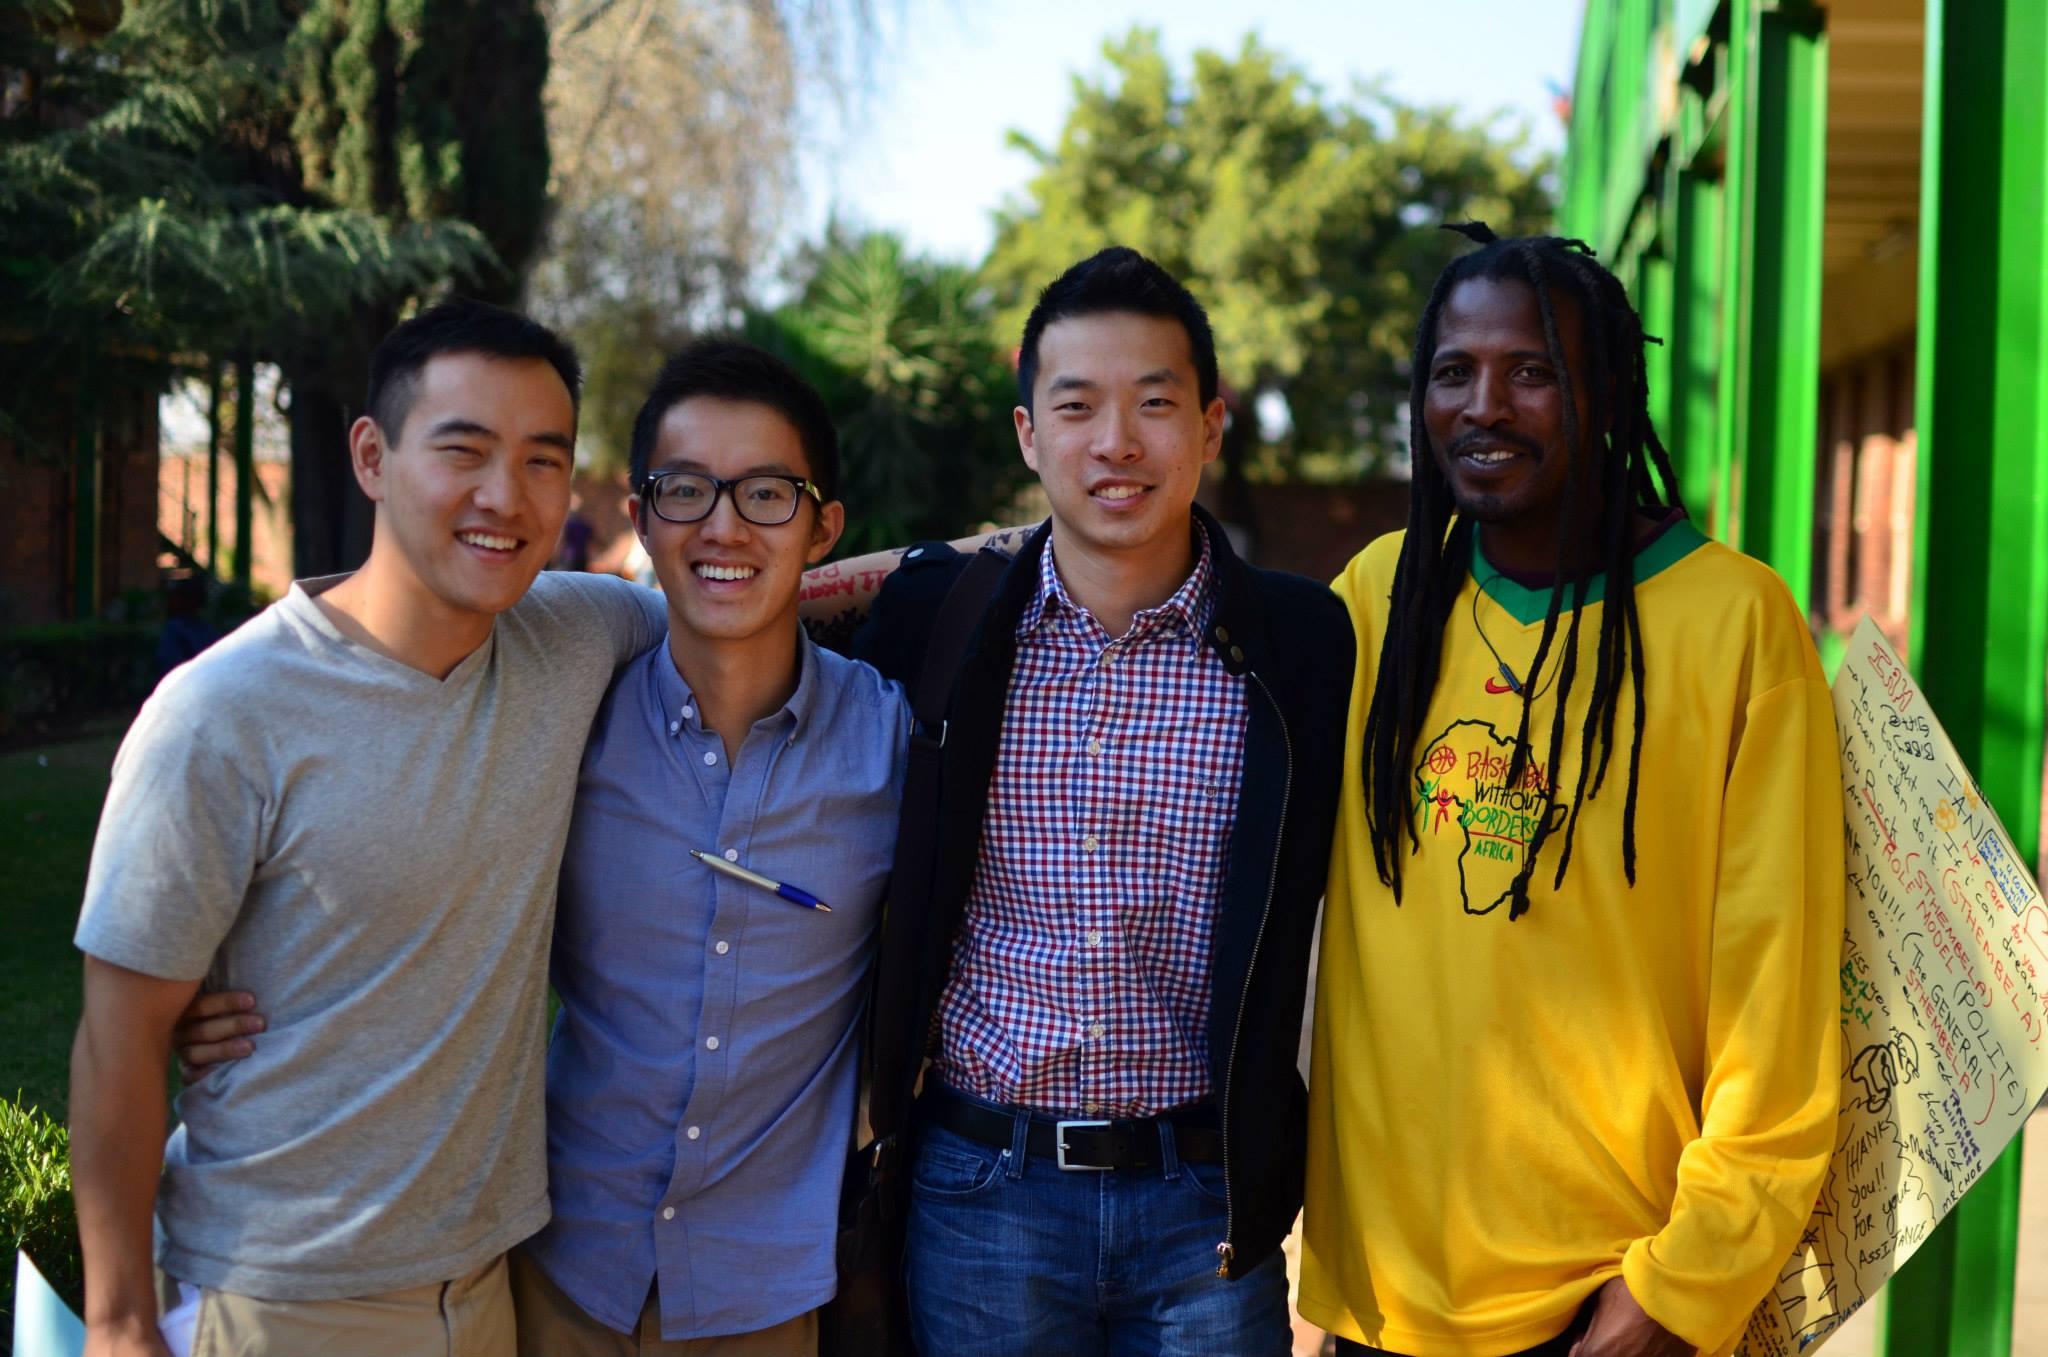 From left: Patrick, Dennis, Ian, Harry Nakeng.